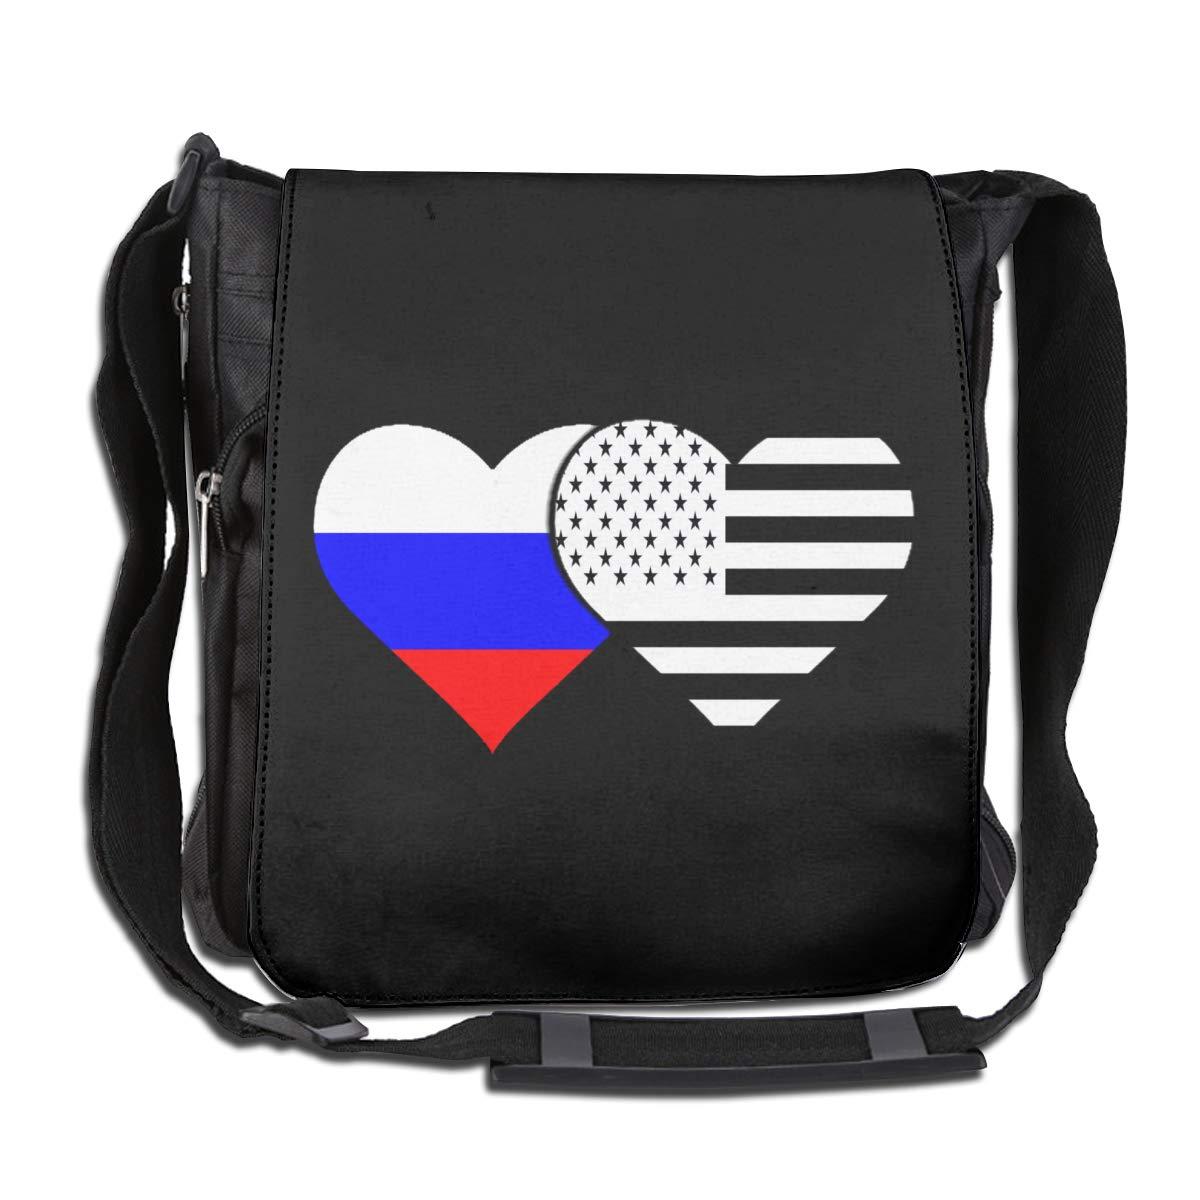 Unisex Messenger Bag Russian Flag And American Flag Crossbody Shoulder Bag